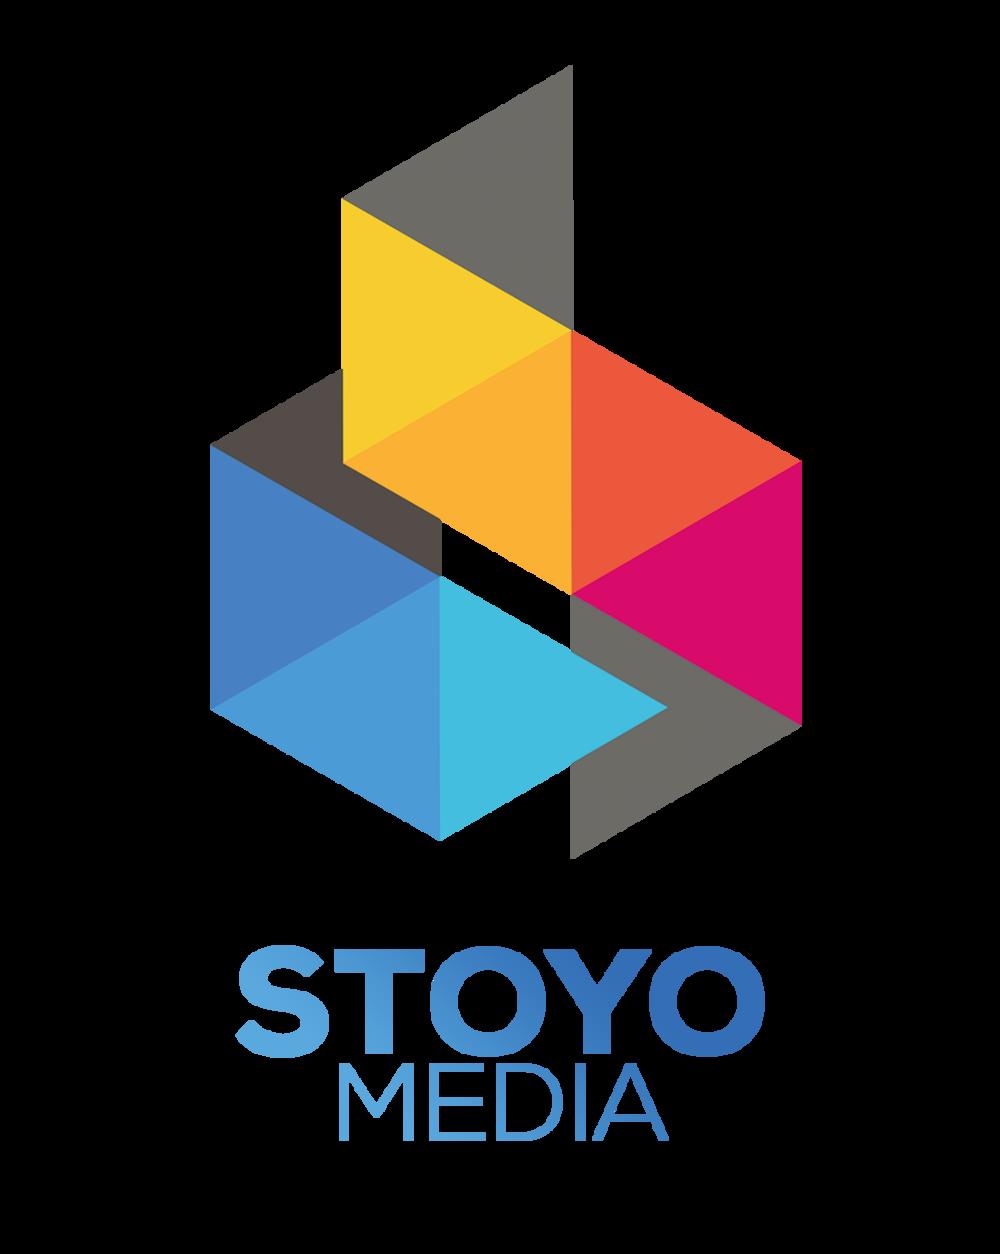 Stoyo Media.png